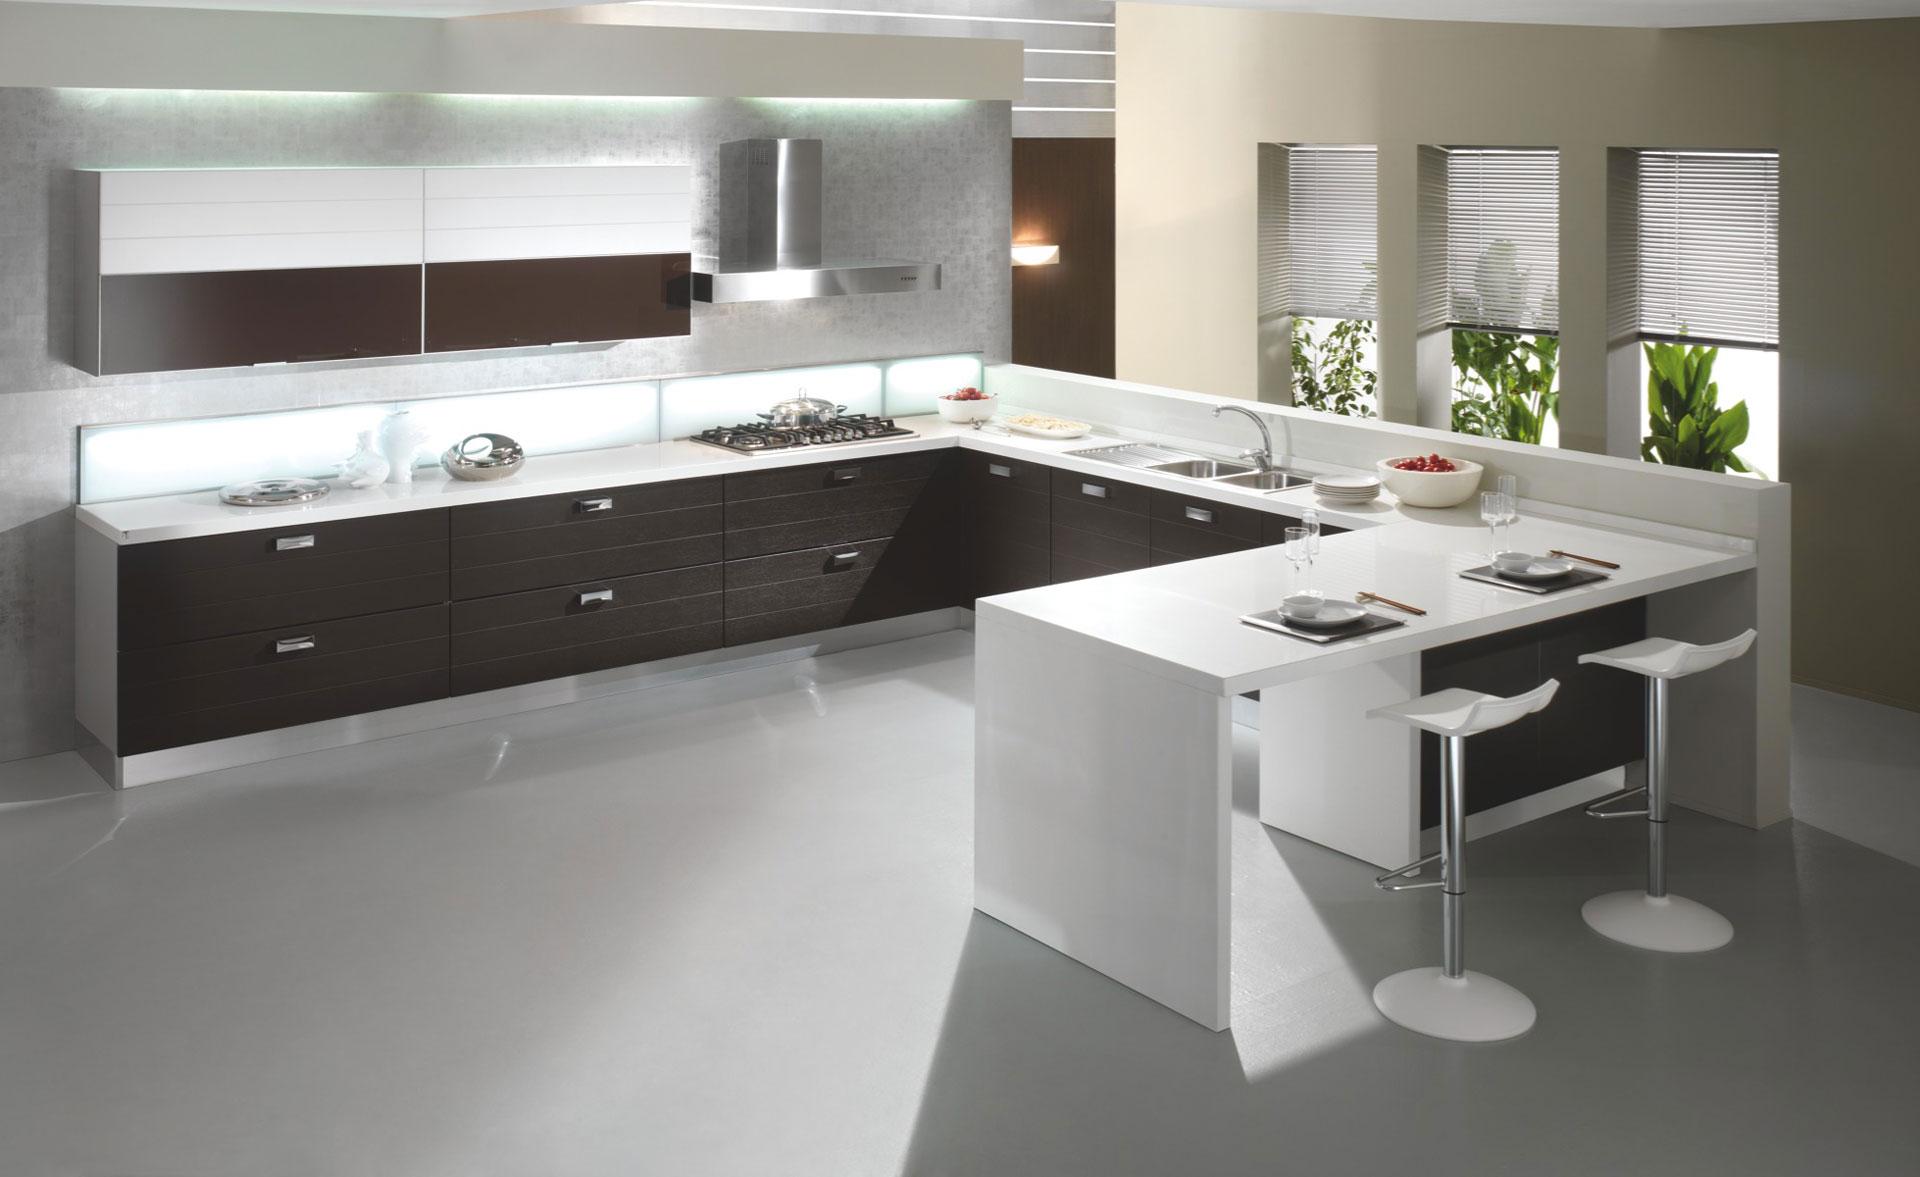 Awesome cucine bianche e nere contemporary ideas - Cucine bianche moderne ...